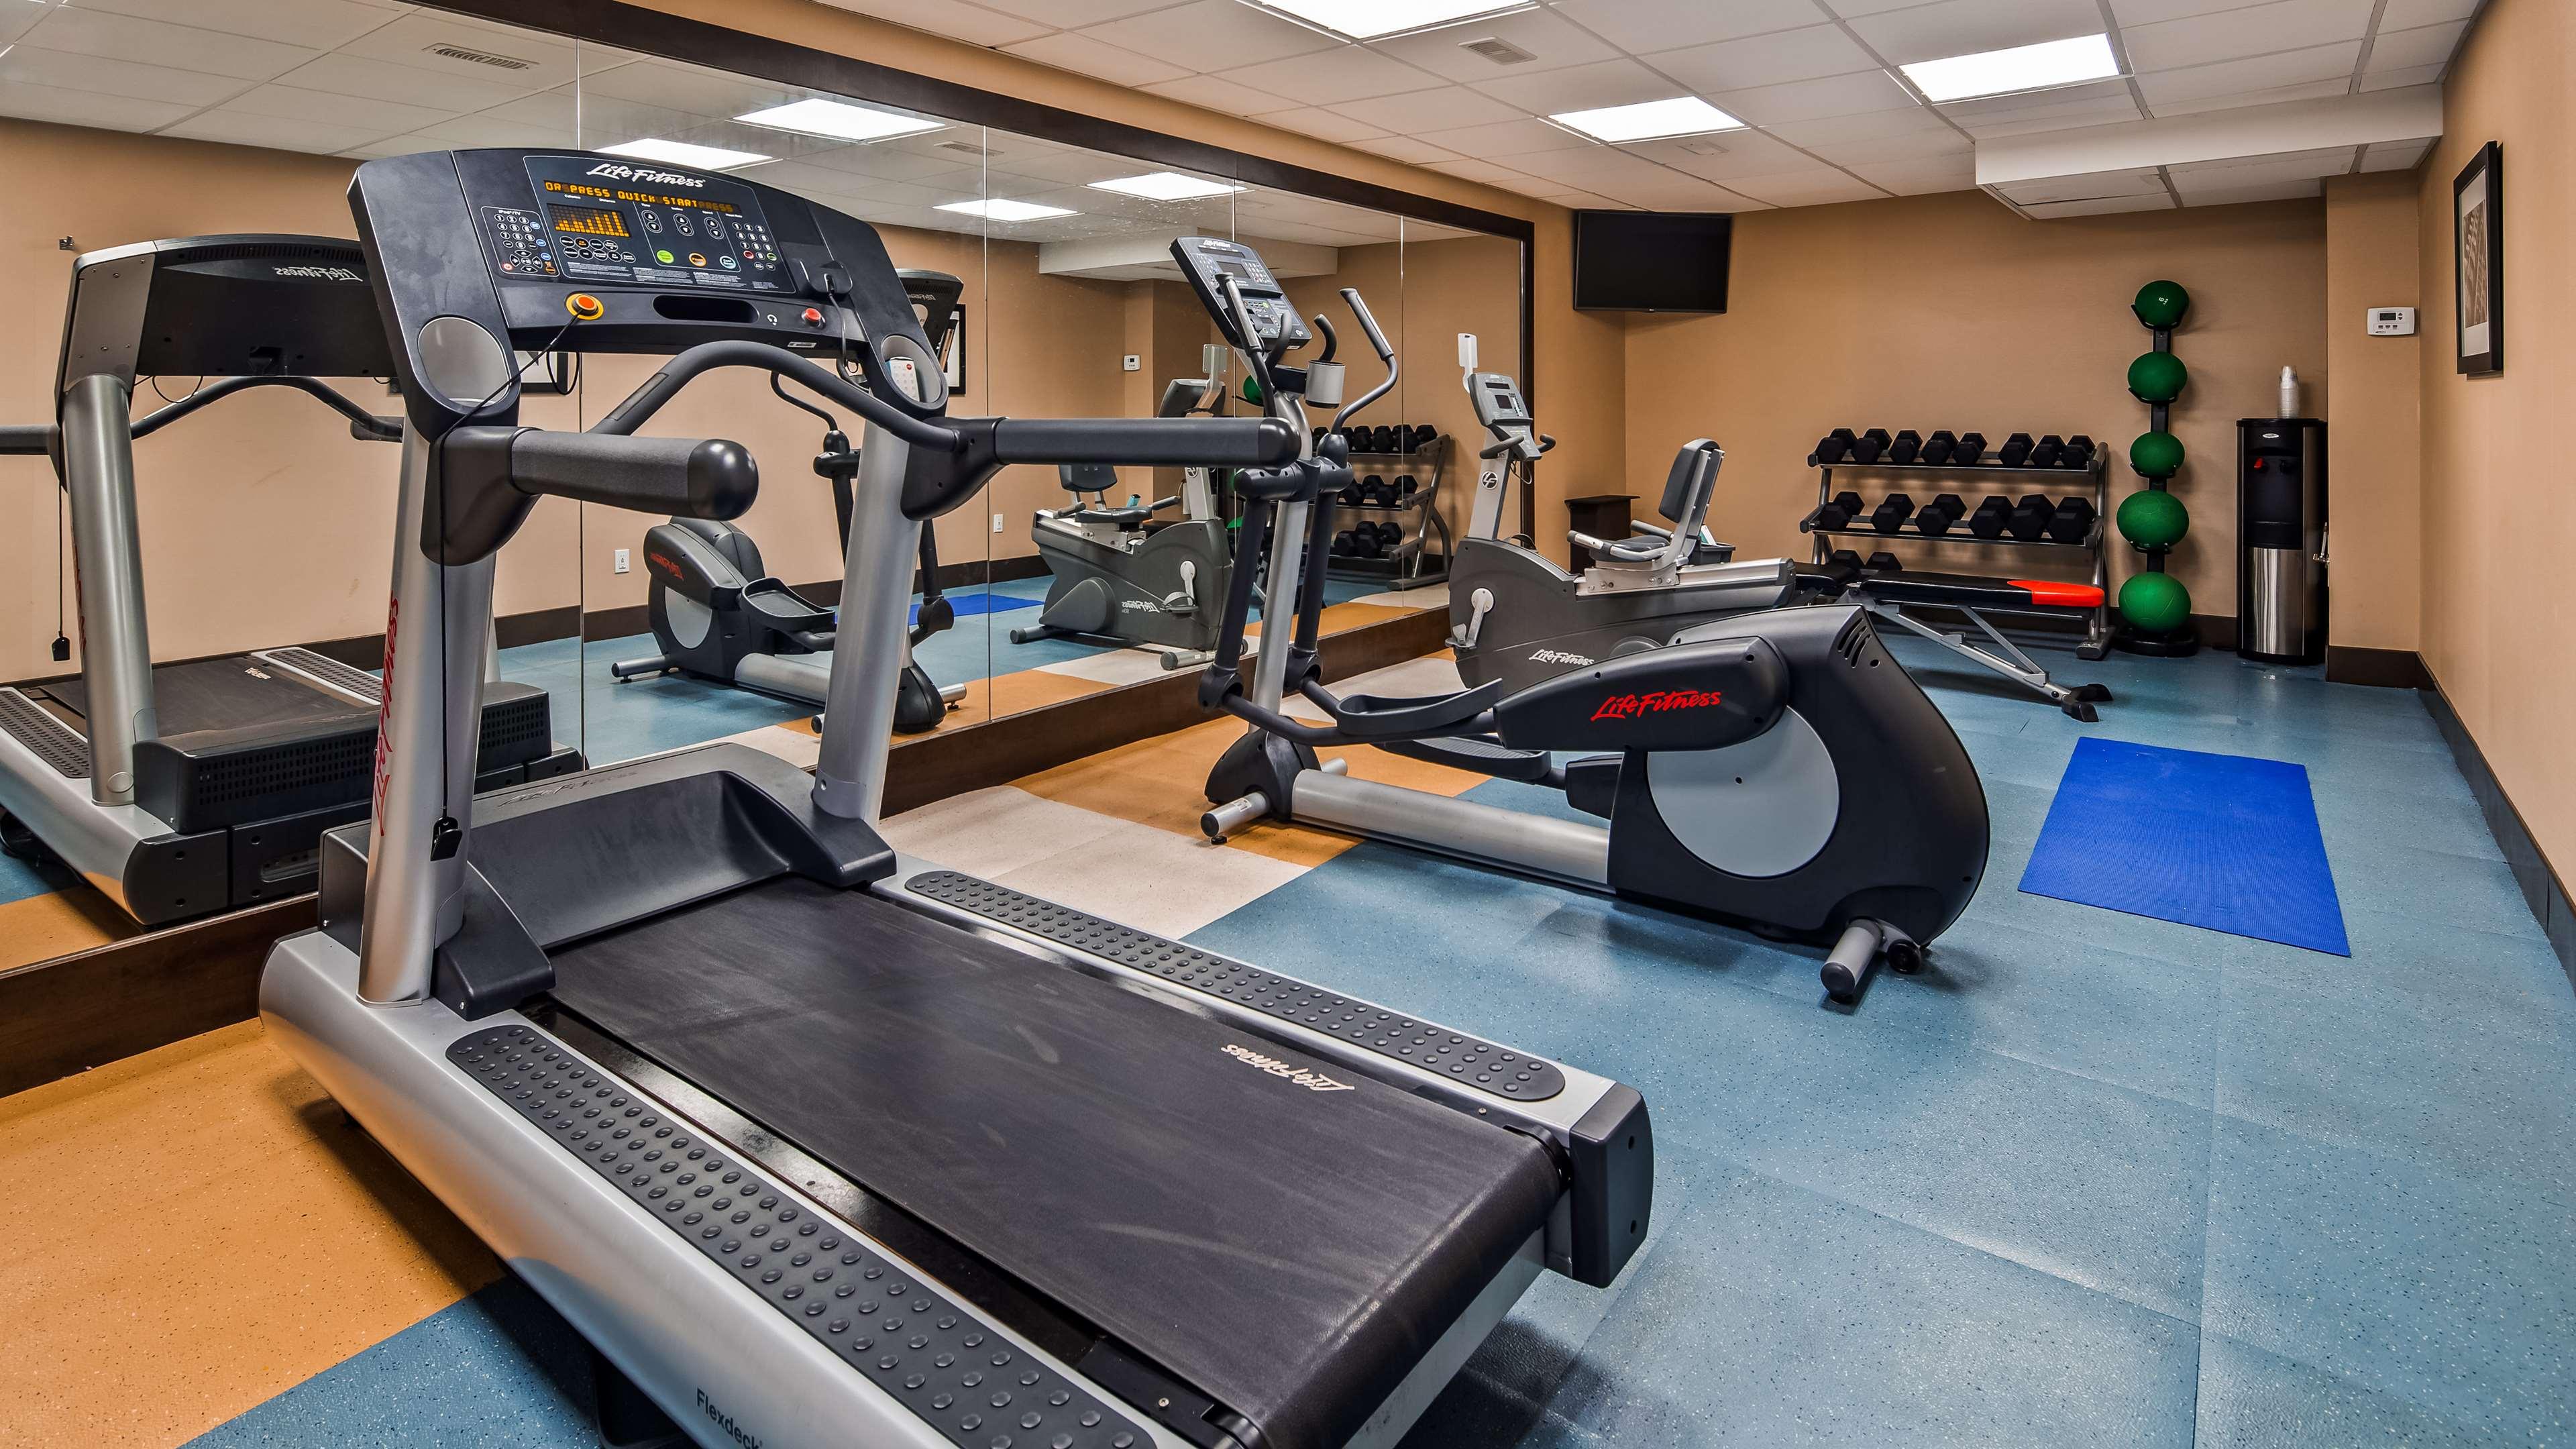 Fitness Centre Best Western Plus Leamington Hotel & Conference Centre Leamington (519)326-8646